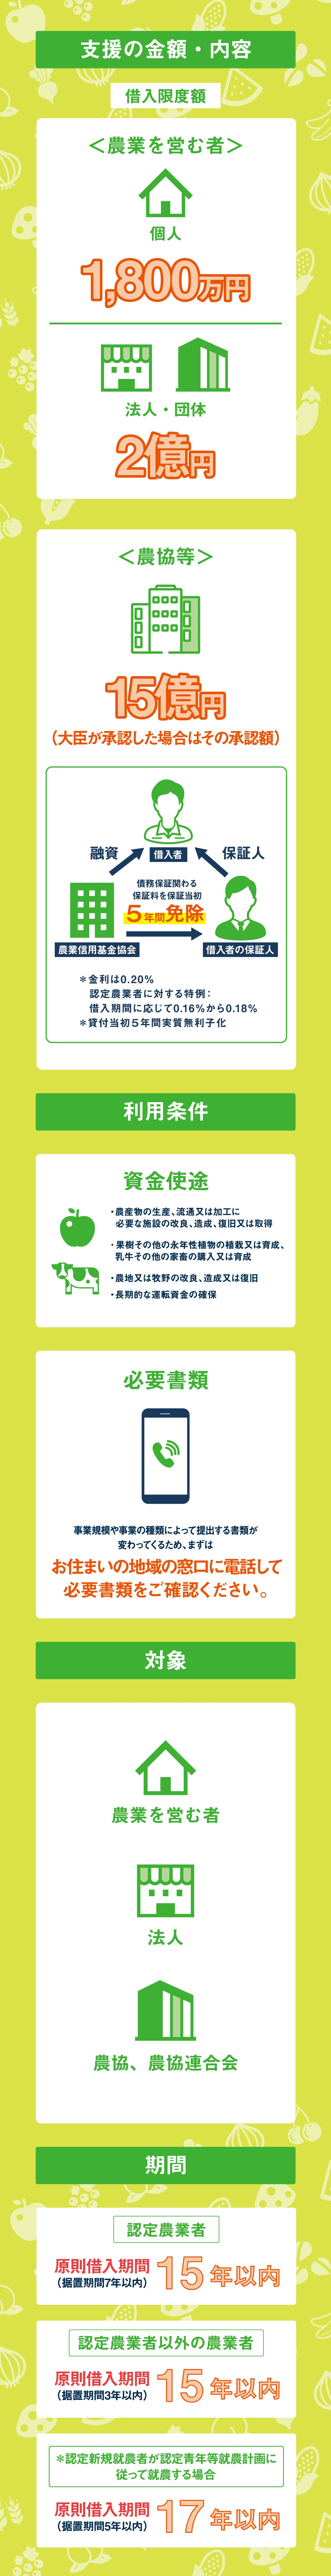 788c4ef836f74744f16a970c818dd03b - 【農業事業者向け】経営改善を行う場合、長期かつ低利で融資を受けることができます。